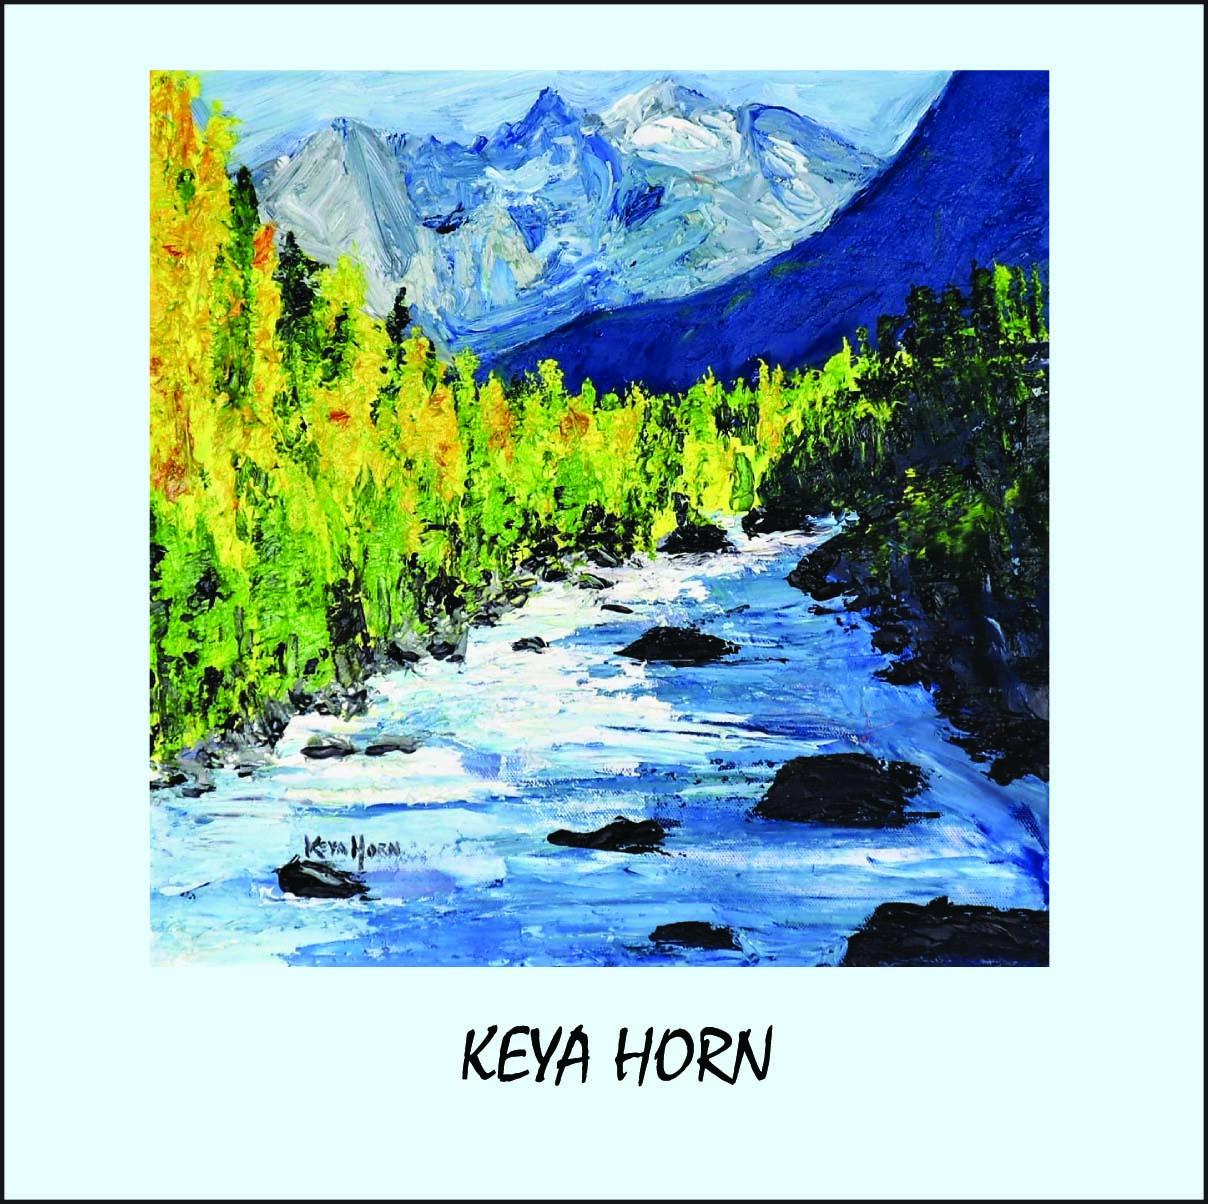 Keya Horn